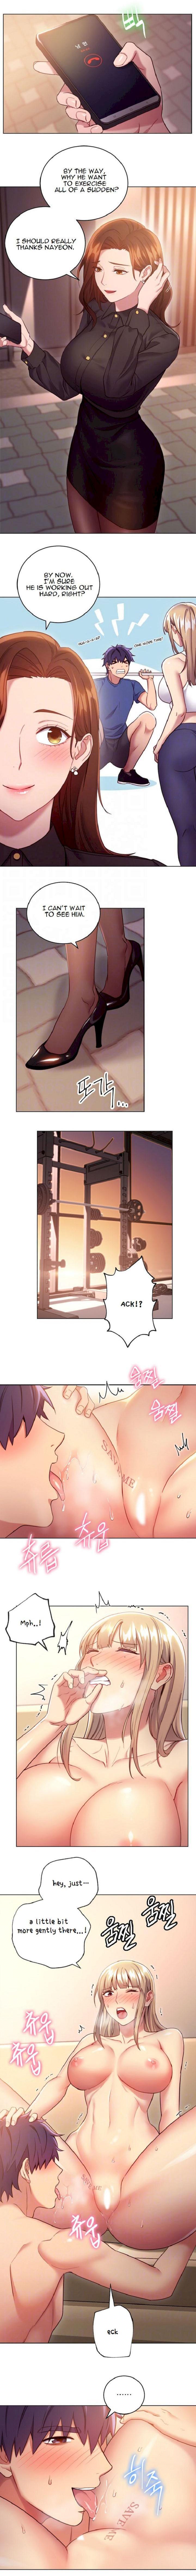 [Neck Pilllow] Stepmother Friends Ch.39/? [English] [Hentai Universe] NEW! 13/10/2020 170